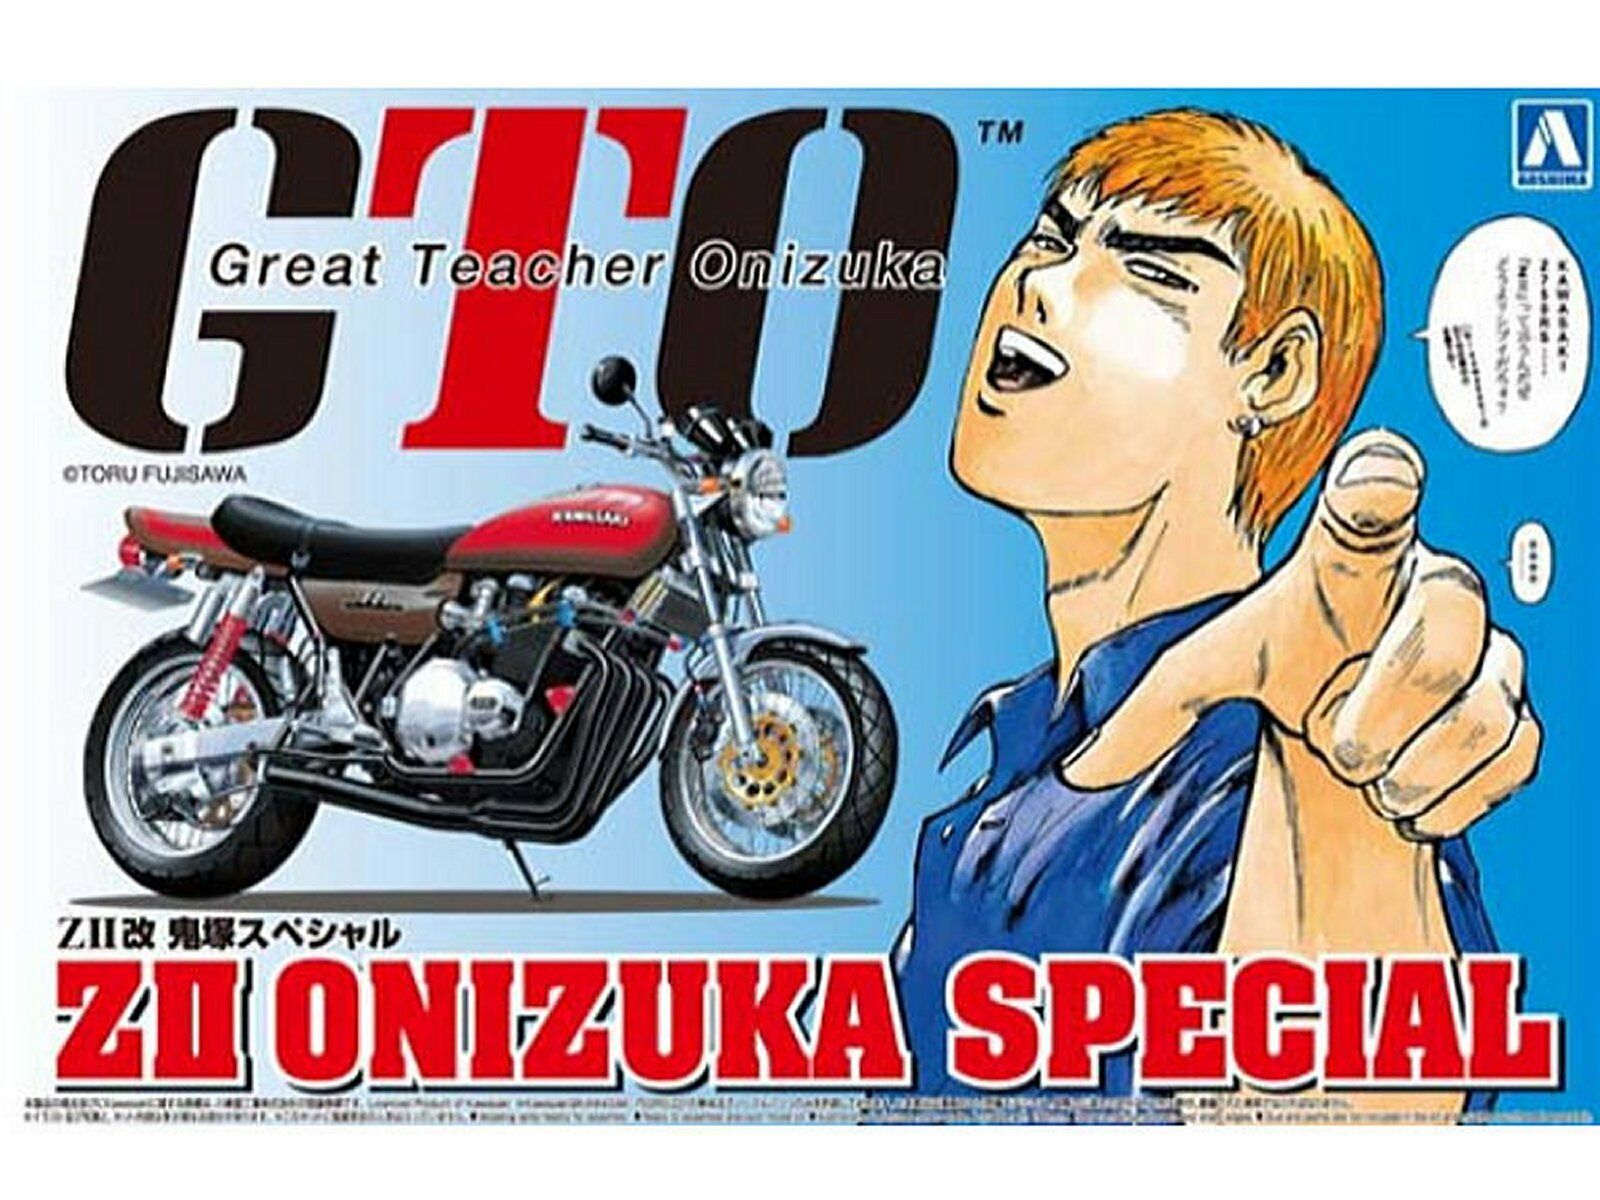 Great Teacher Onizuka Onizuka Onizuka : ZII Onizuka   ( Kawasaki 900 ) 1/12 ( Aoshima ) | être Dans L'utilisation  8e7dc5